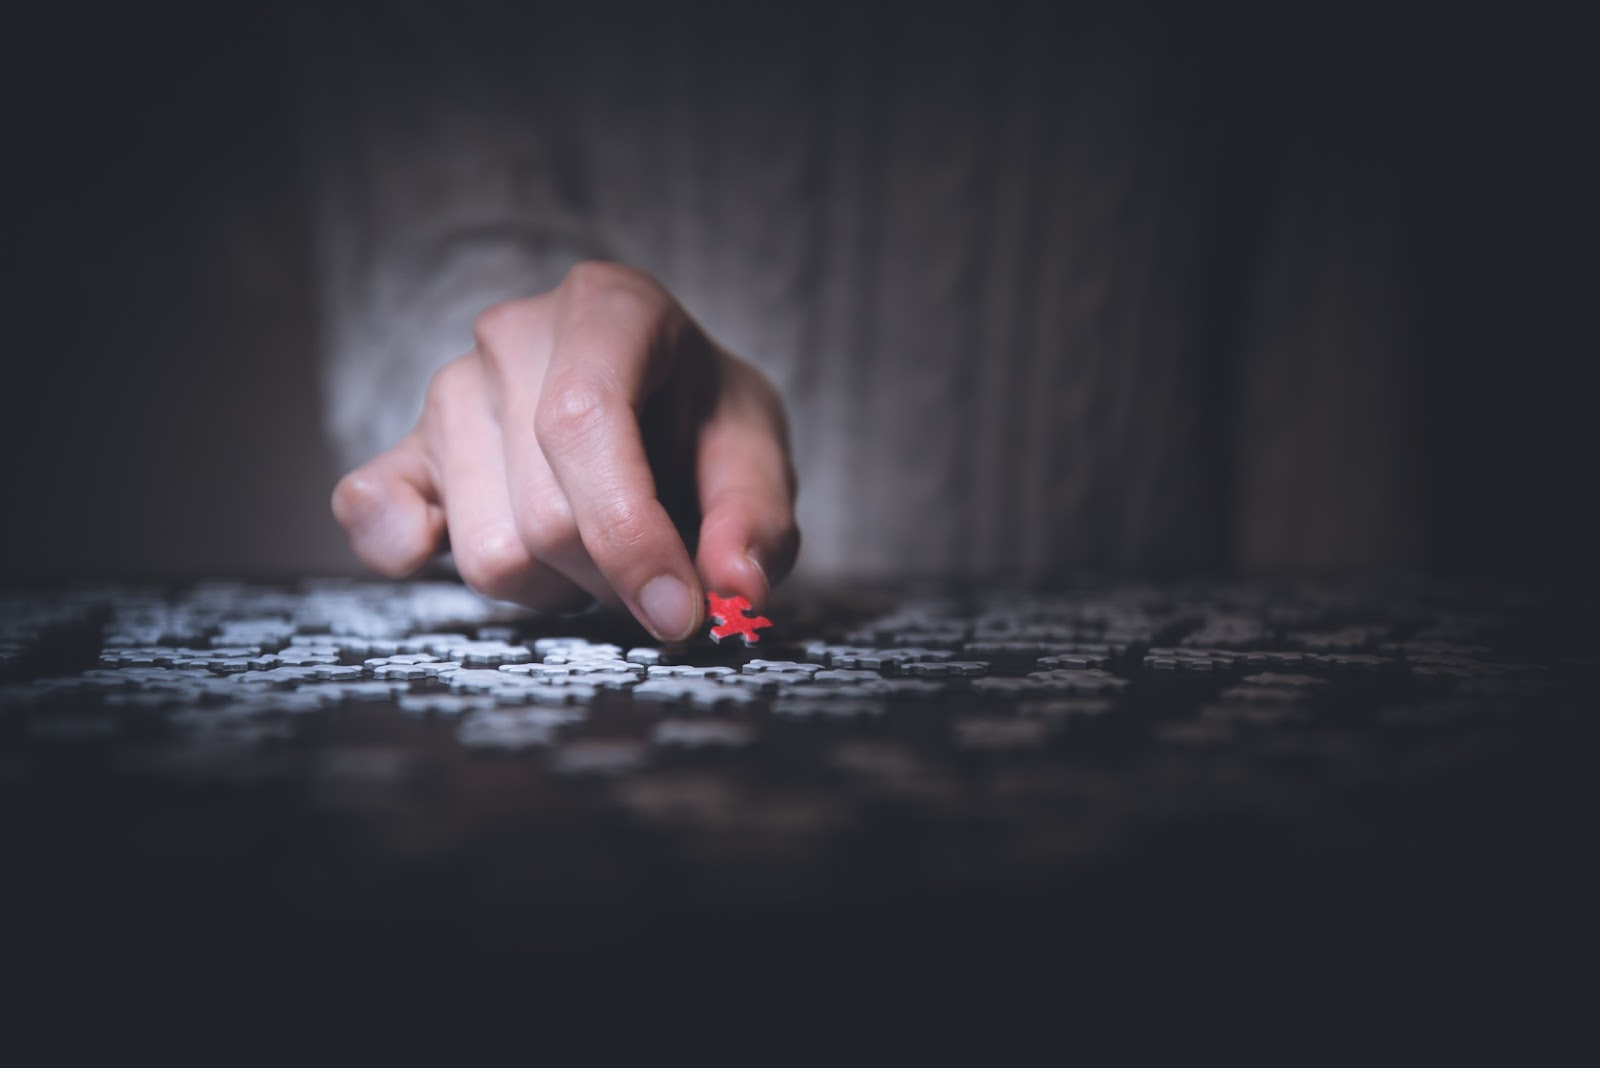 anxiety crossword clue